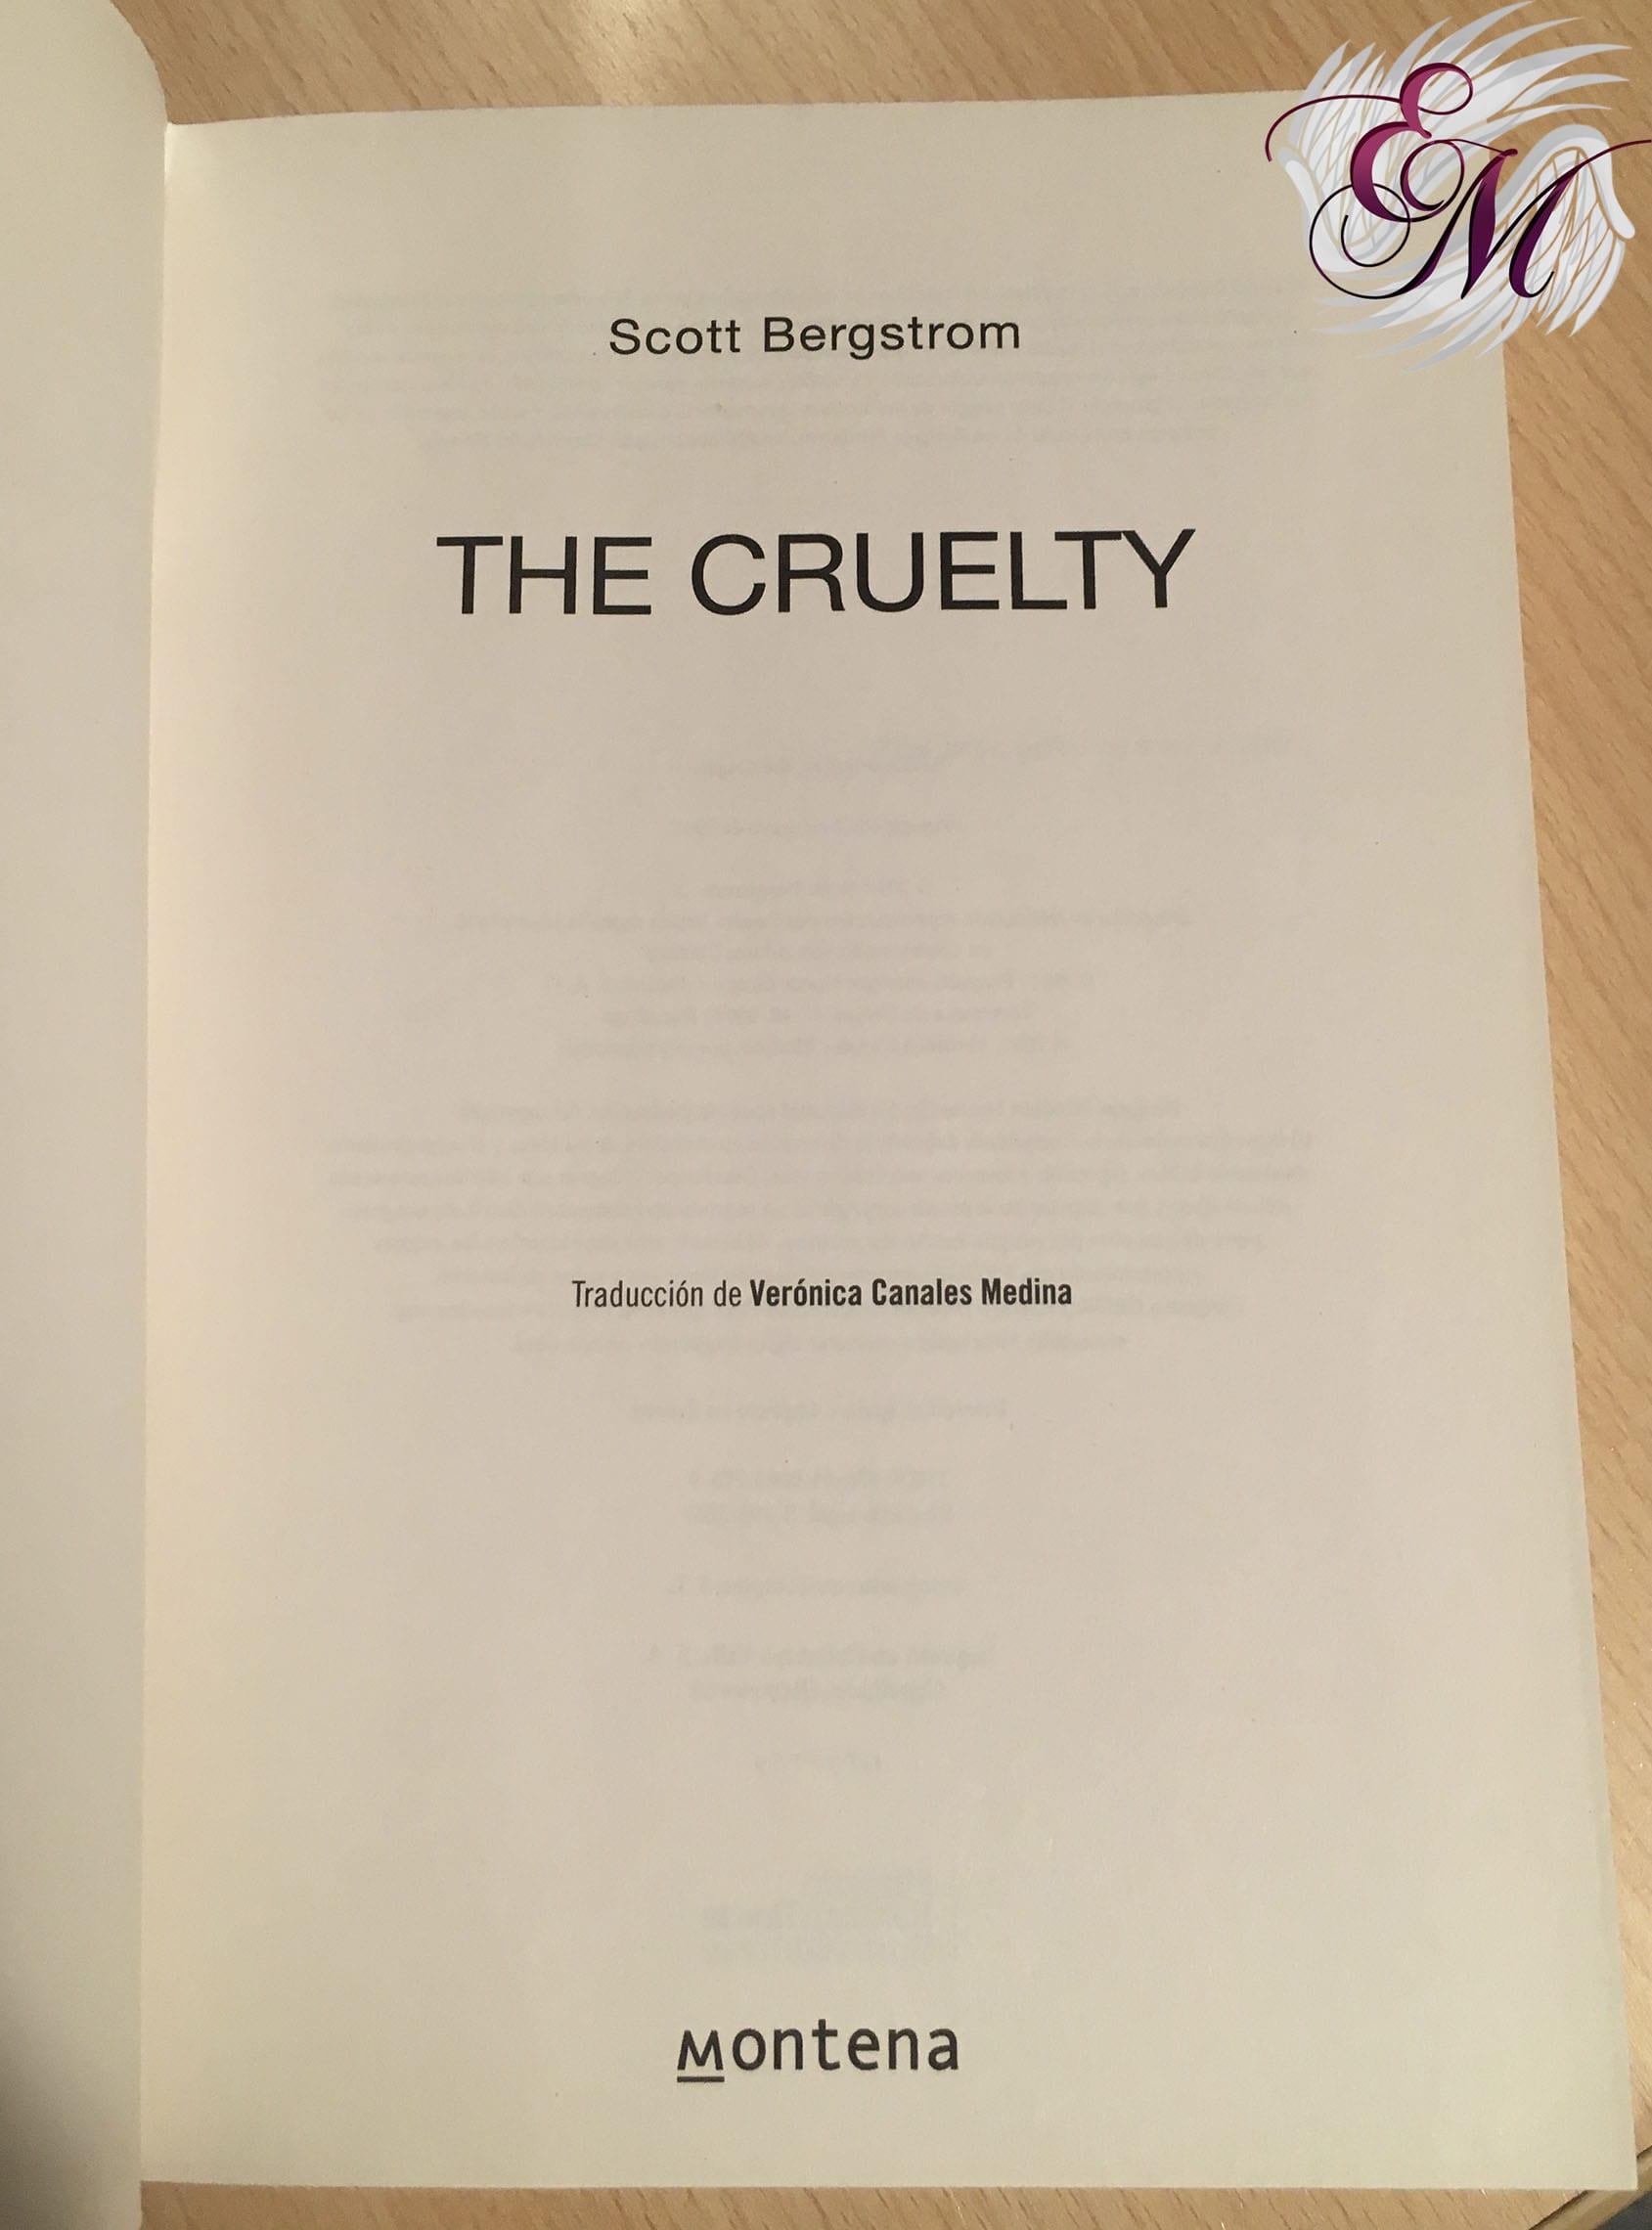 The Cruelty, de Scott Bergstrom - Reseña